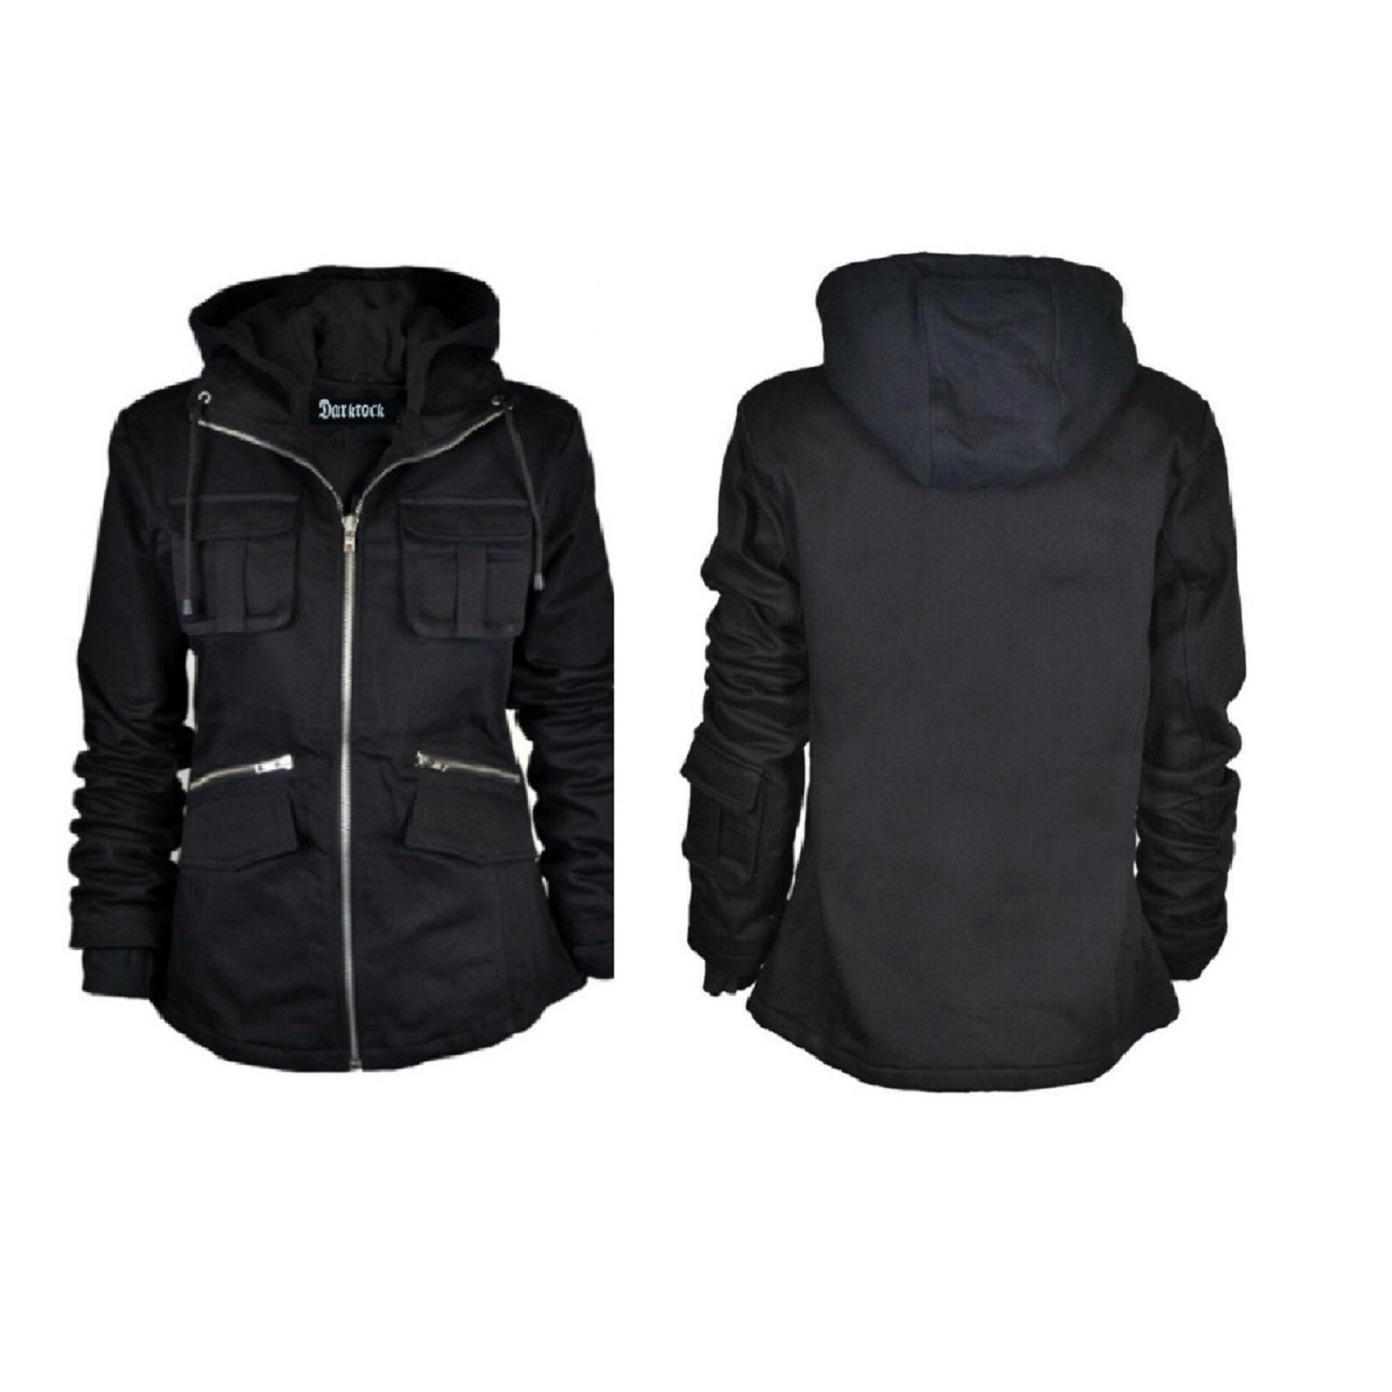 DarkRock PRIME Ladies Parka Jacket Women Cotton Casual Trench Coat WHood (3)